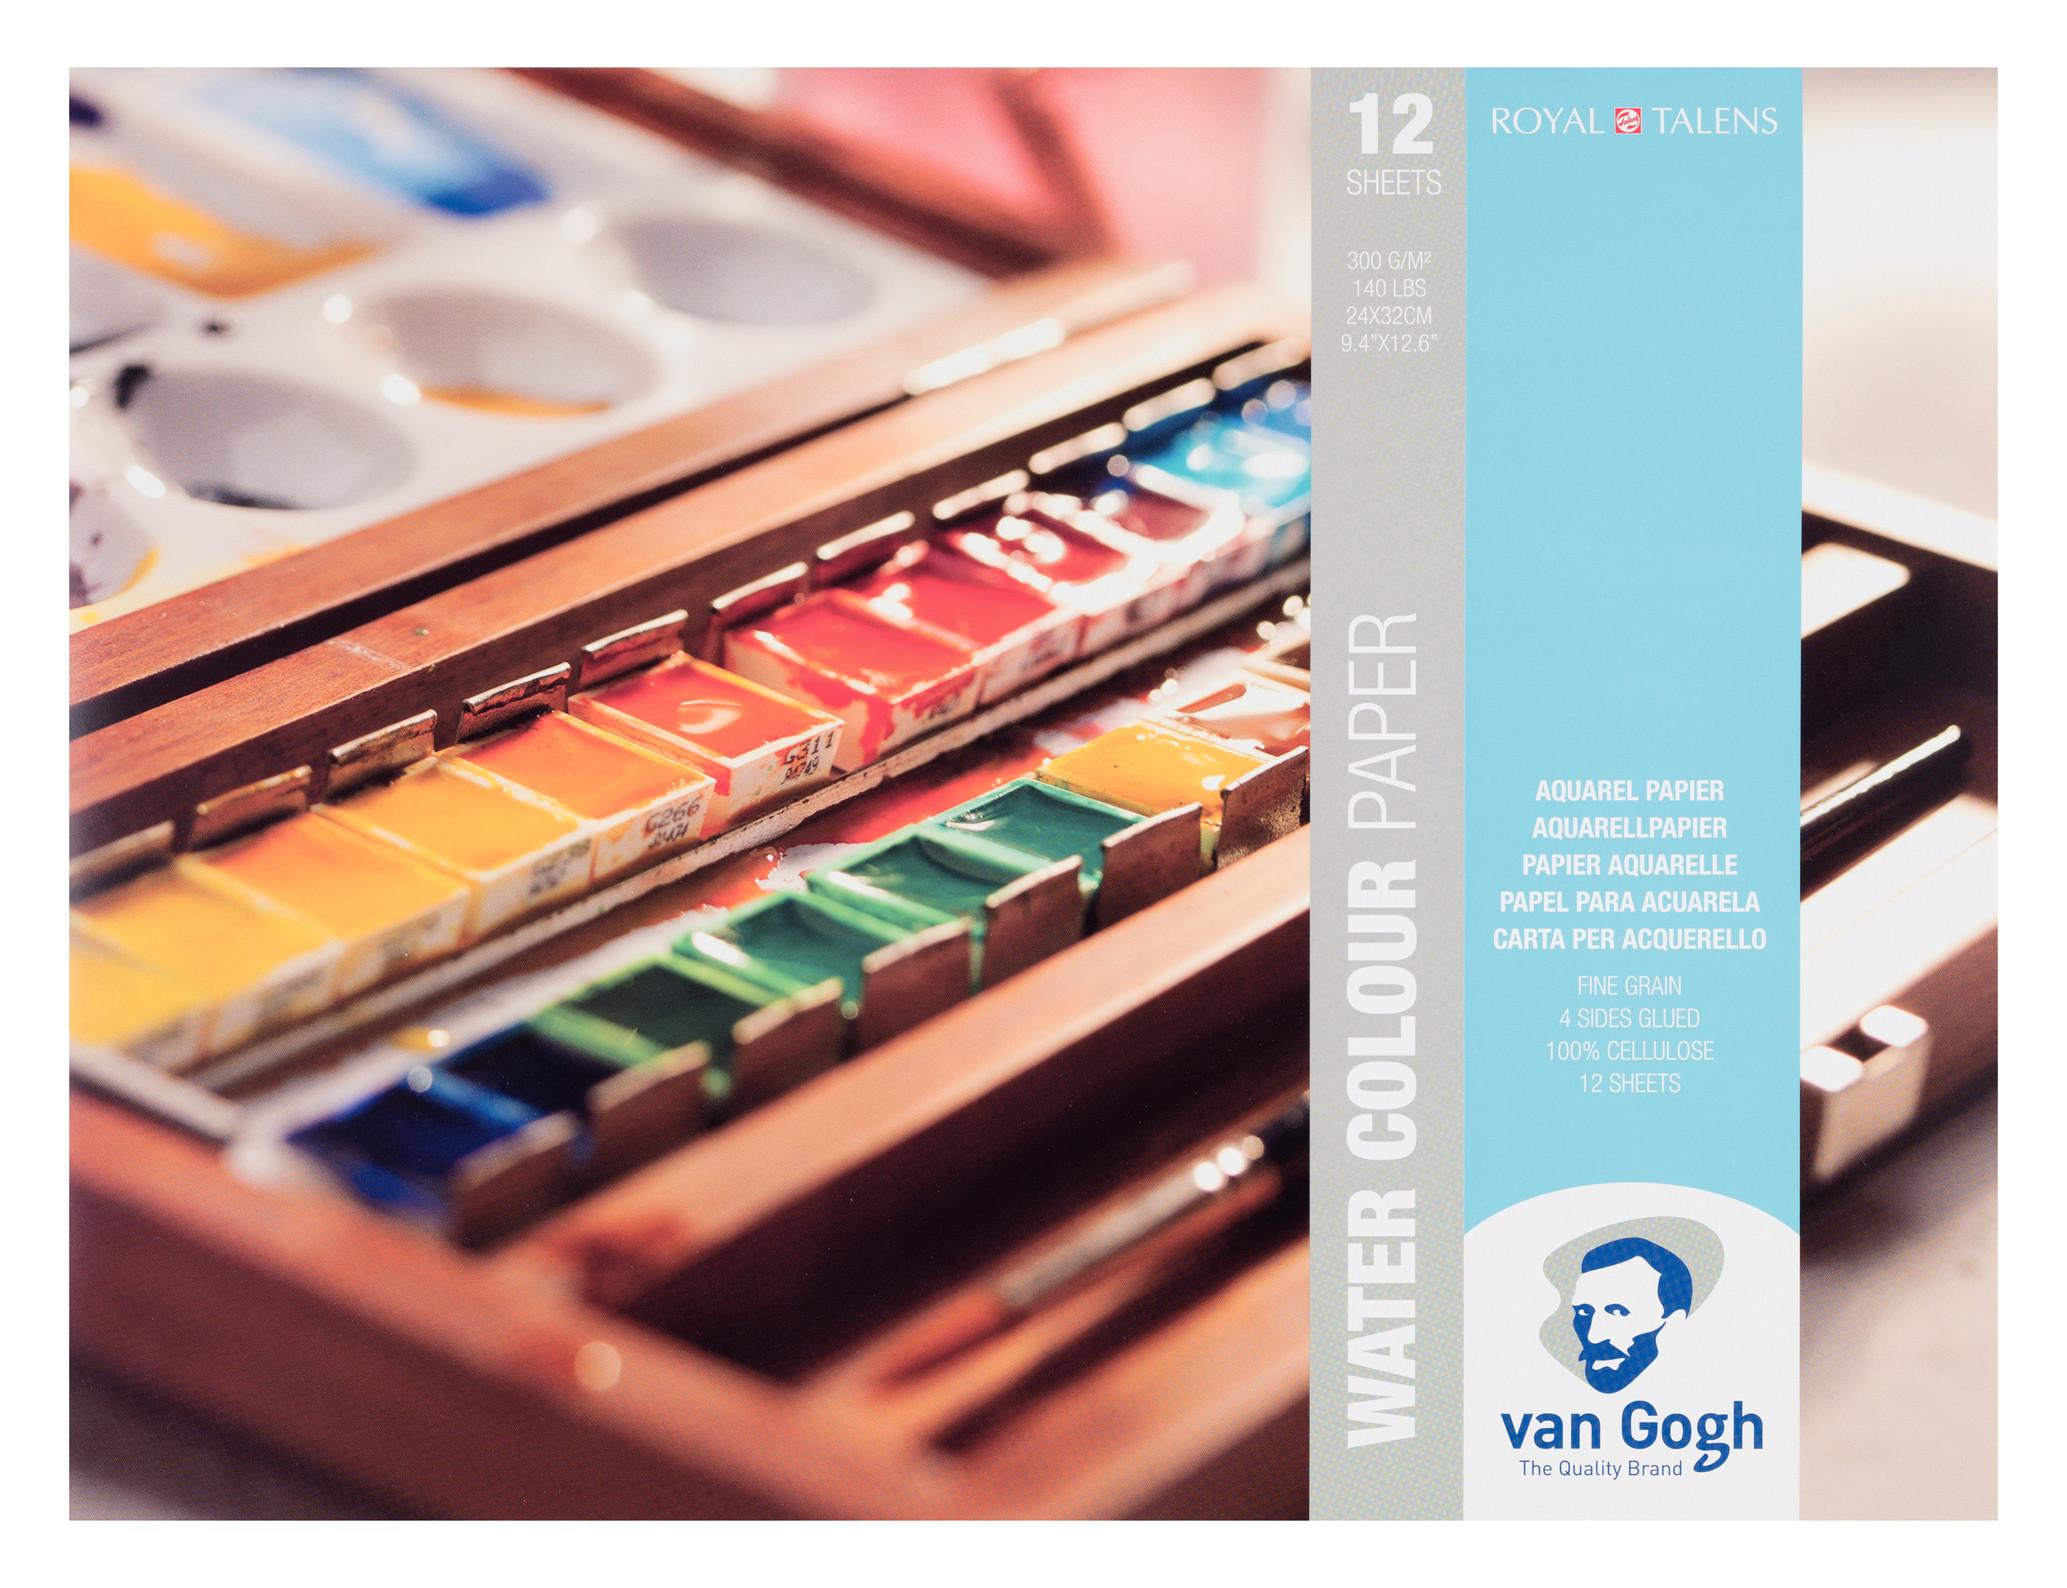 Van Gogh Water Colour Paper Block, 12 Sheets, 300g/140lb., size 24 x 32cm / 9.4 x 12.6